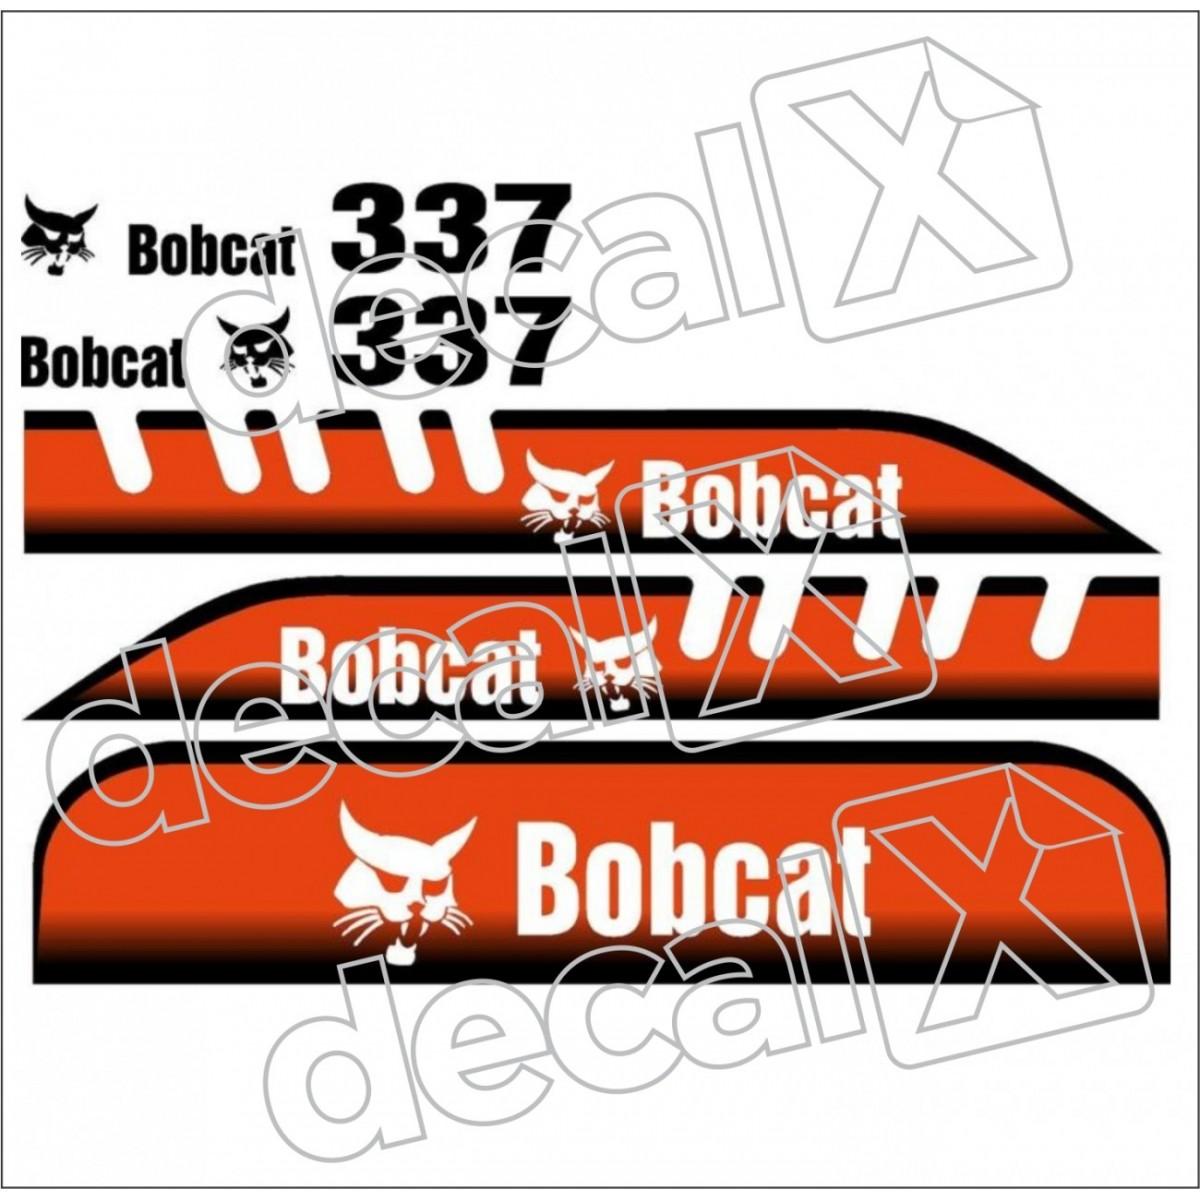 Kit Adesivos Bobcat 337 Decalx